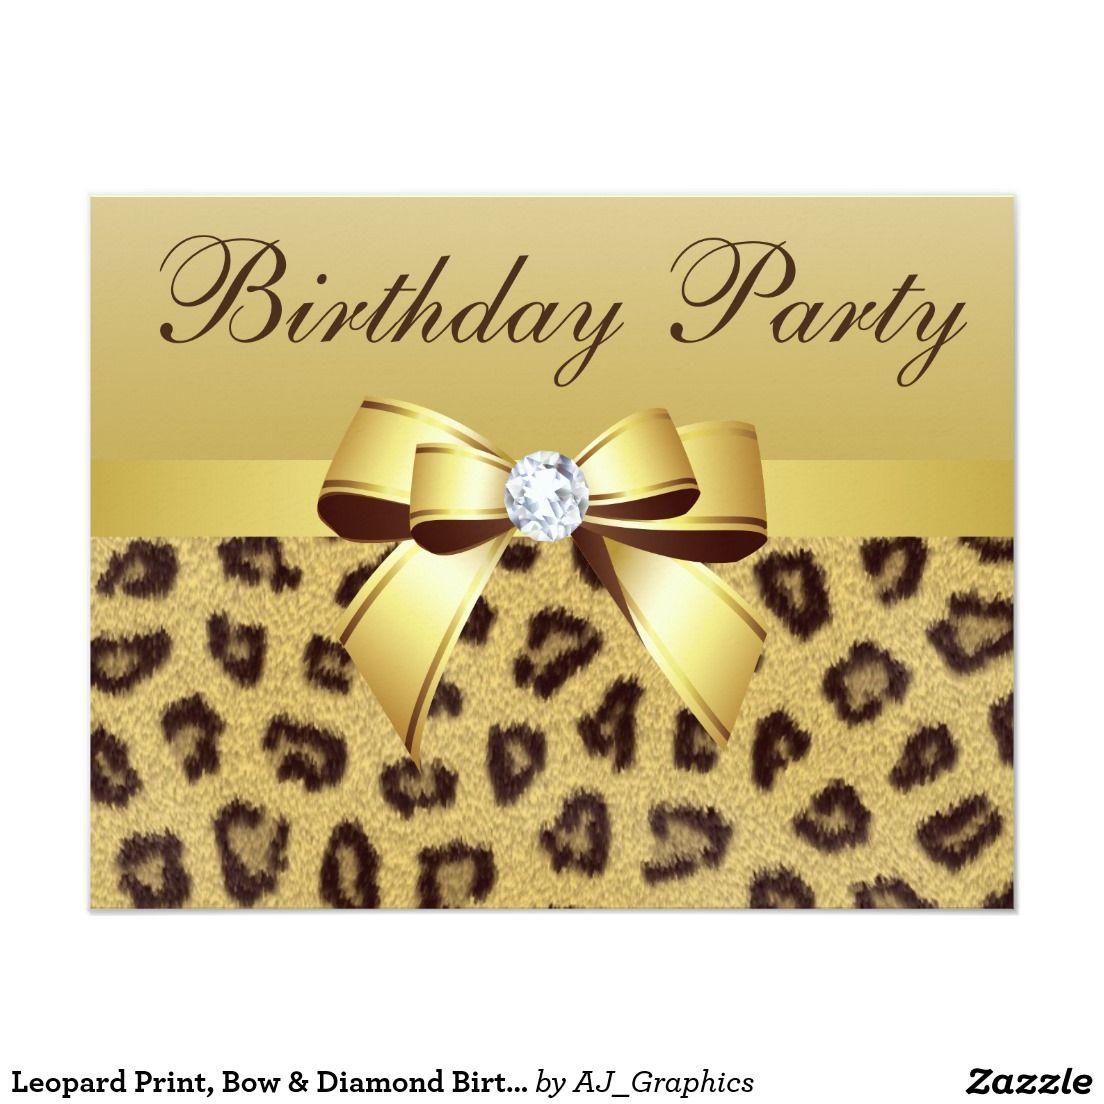 Leopard Print, Bow & Diamond Birthday Party Card | Graduation ...